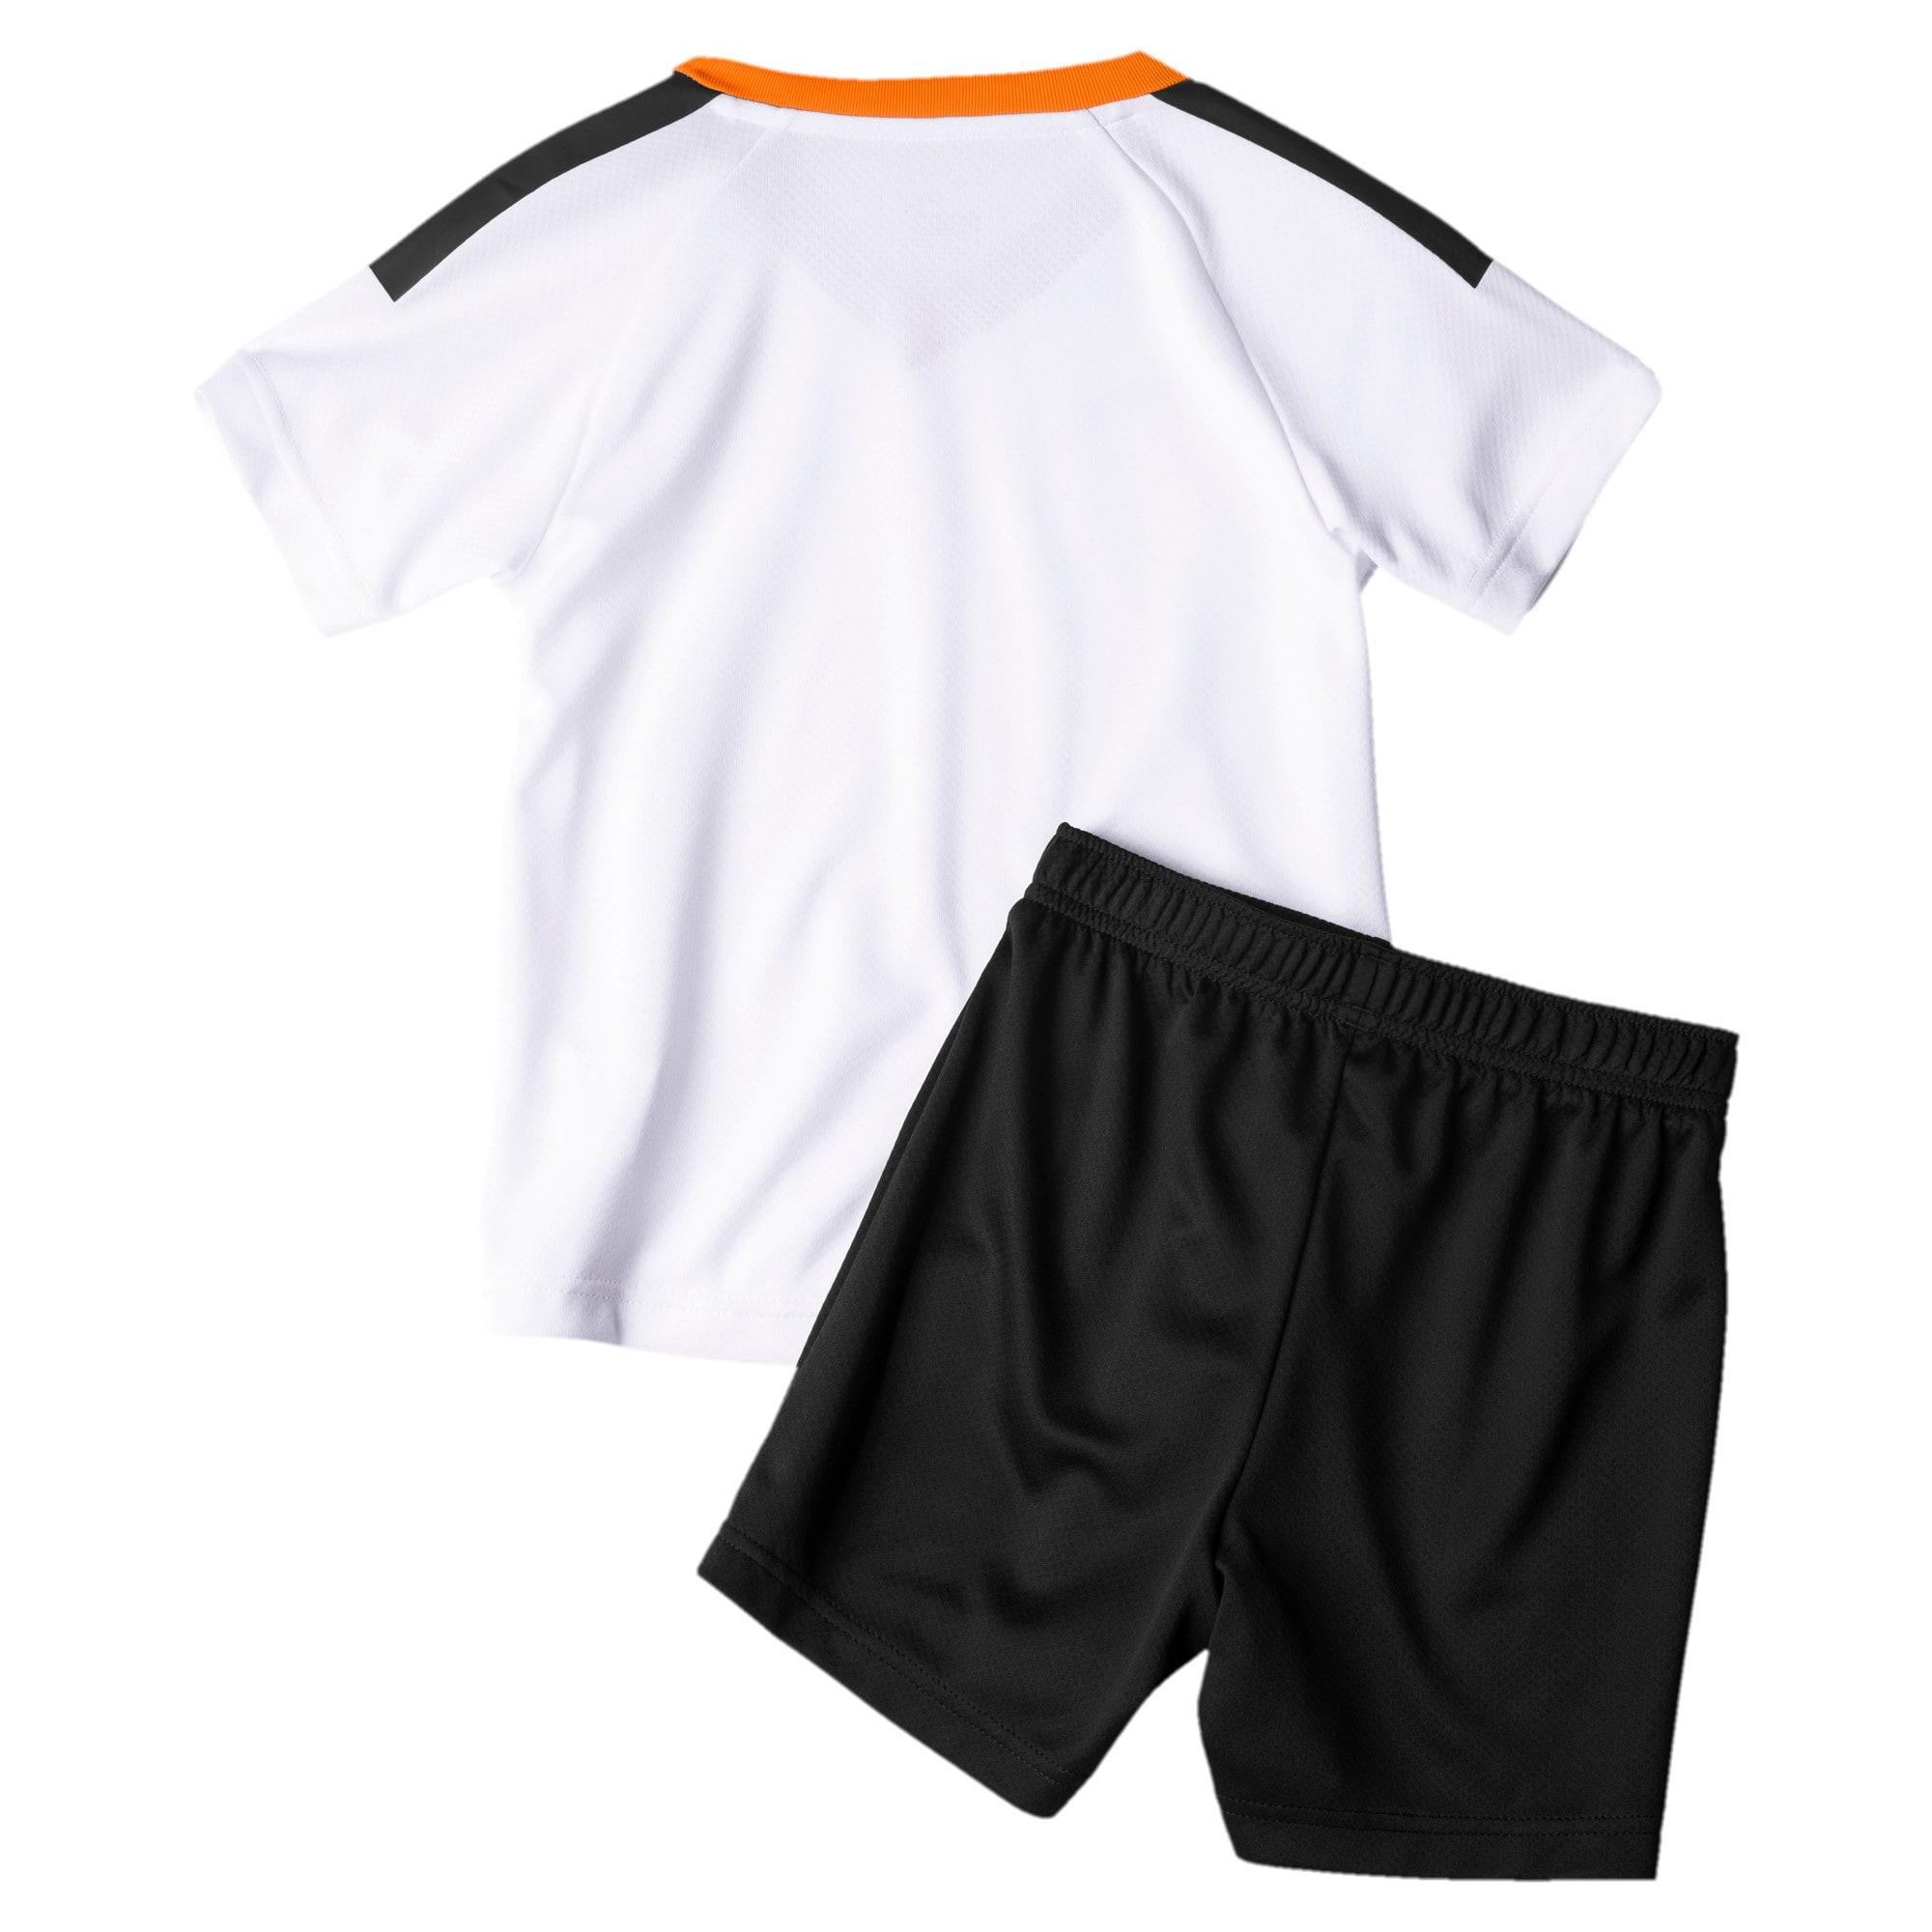 Imagen en miniatura 2 de Minikit de la primera equipación de niño Valencia CF, White- Black-Vibrant Orange, mediana